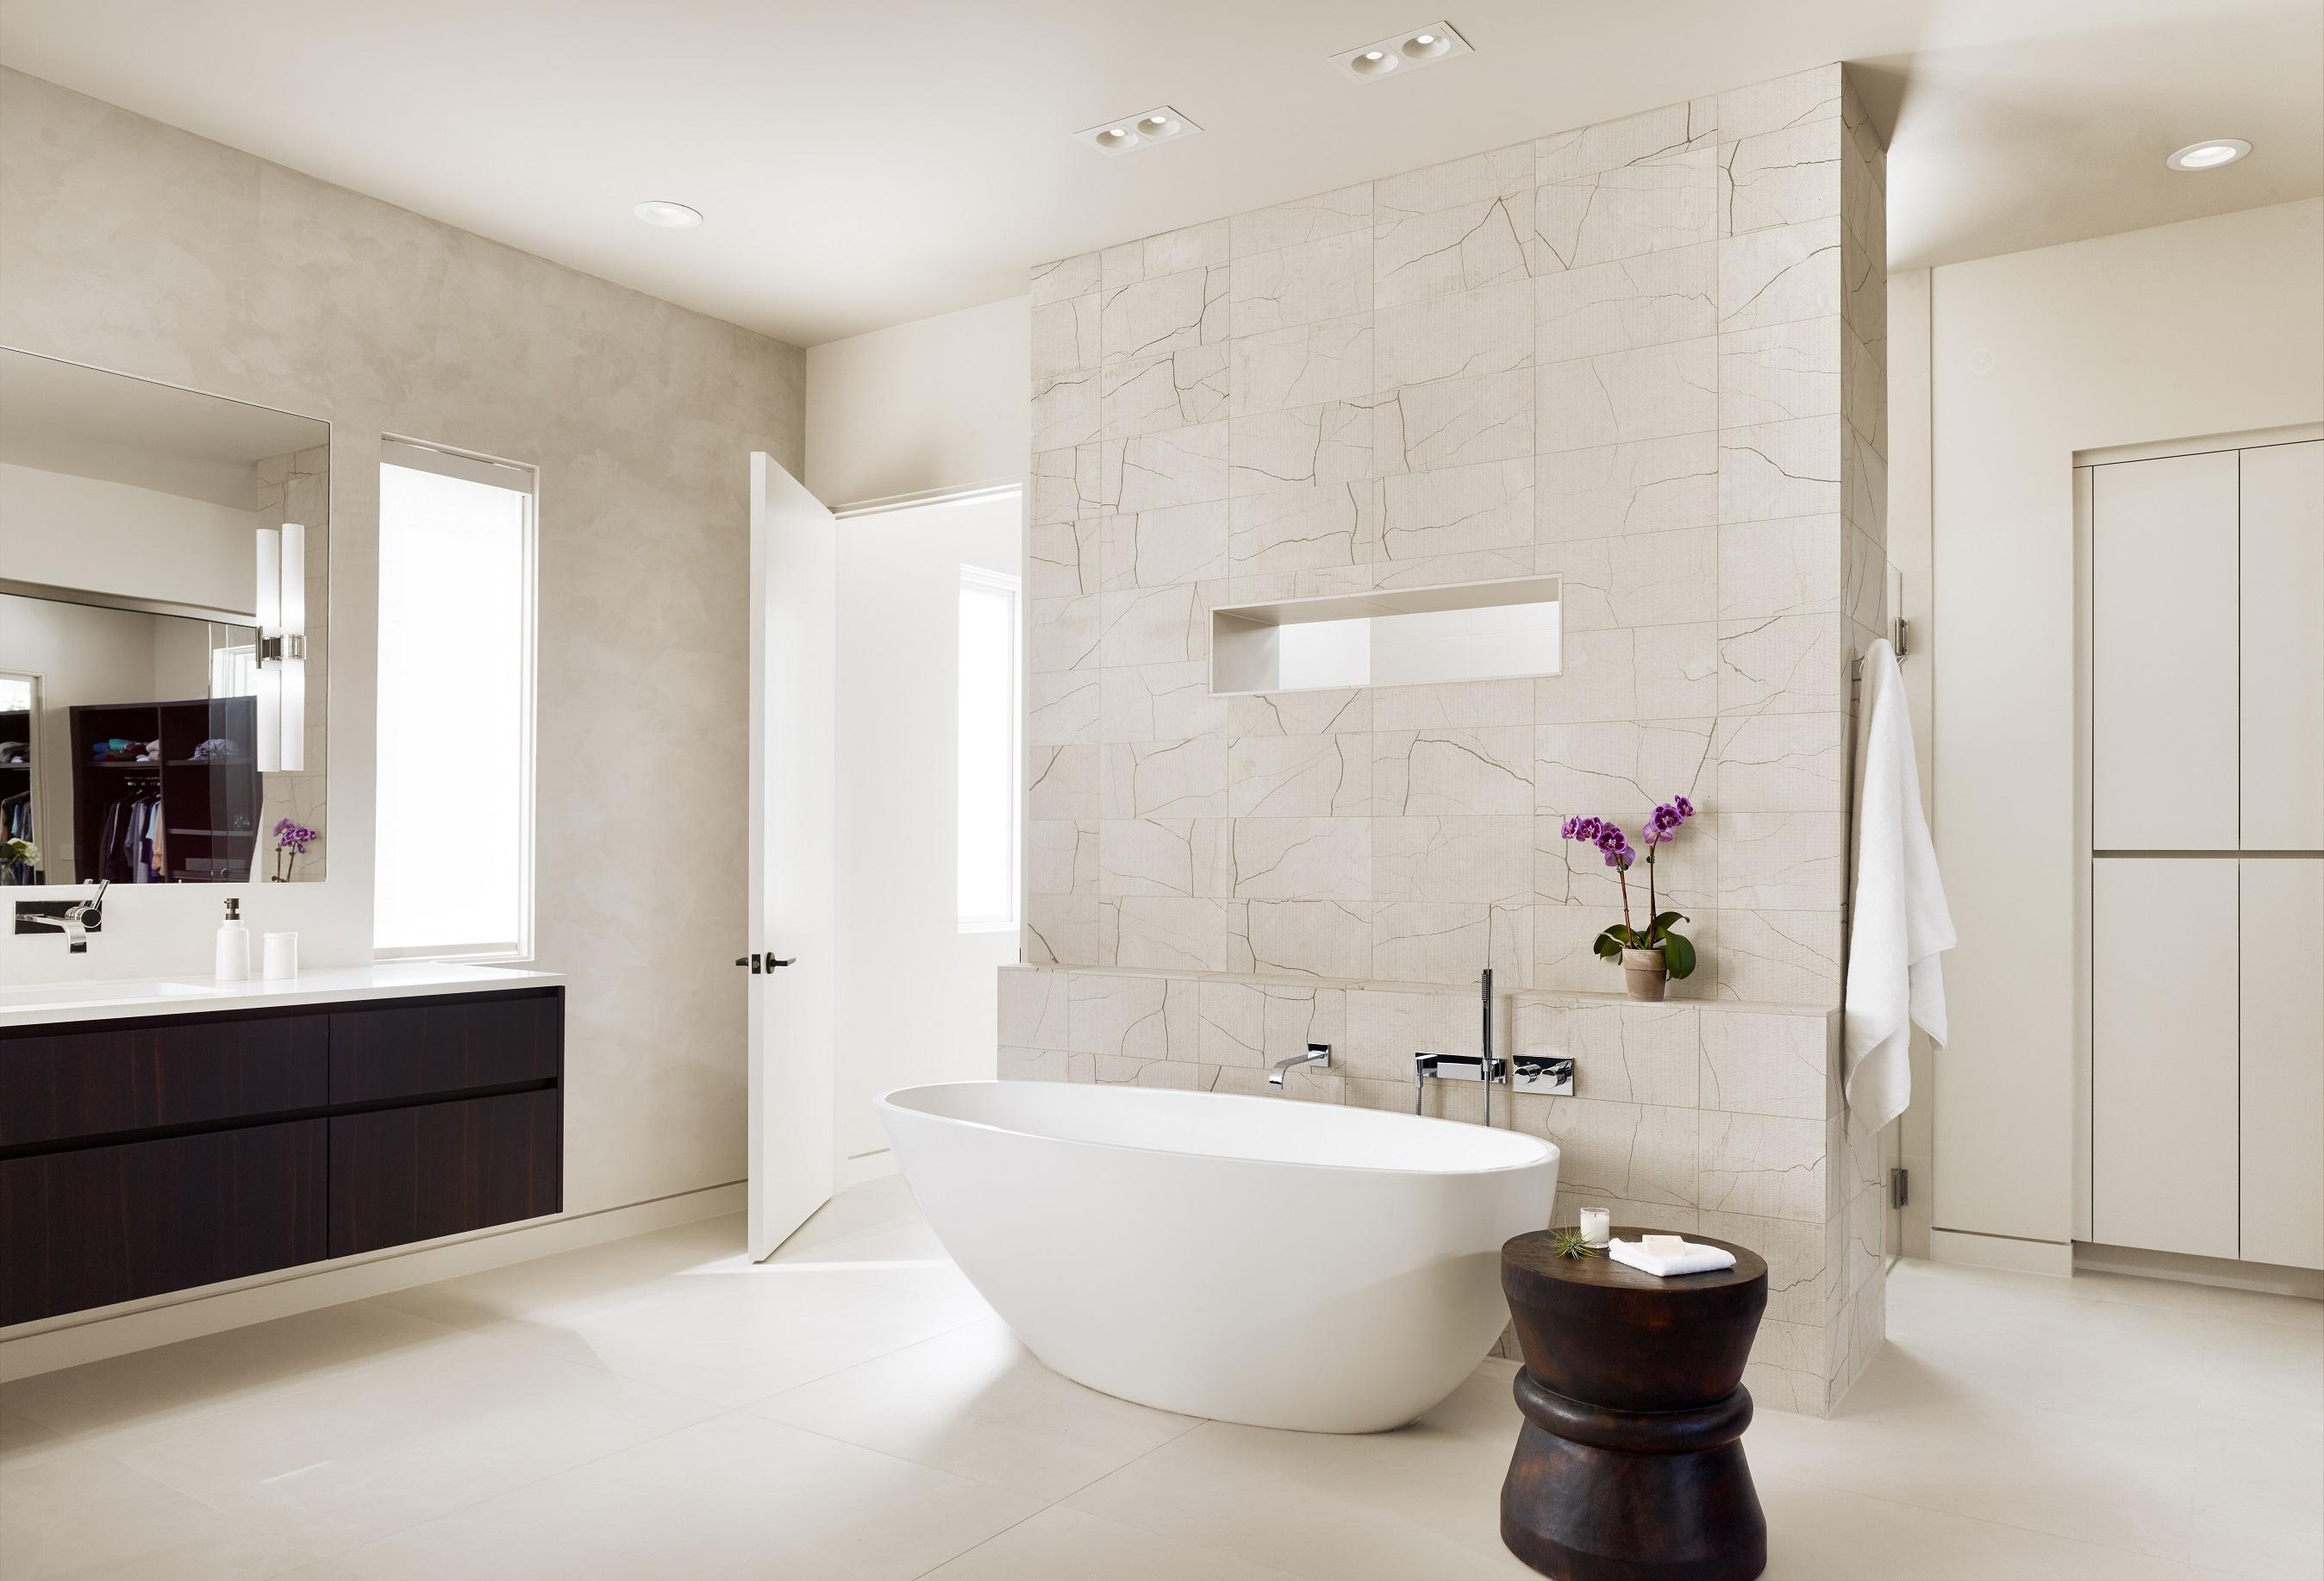 Rollingwood residence - master bathroom